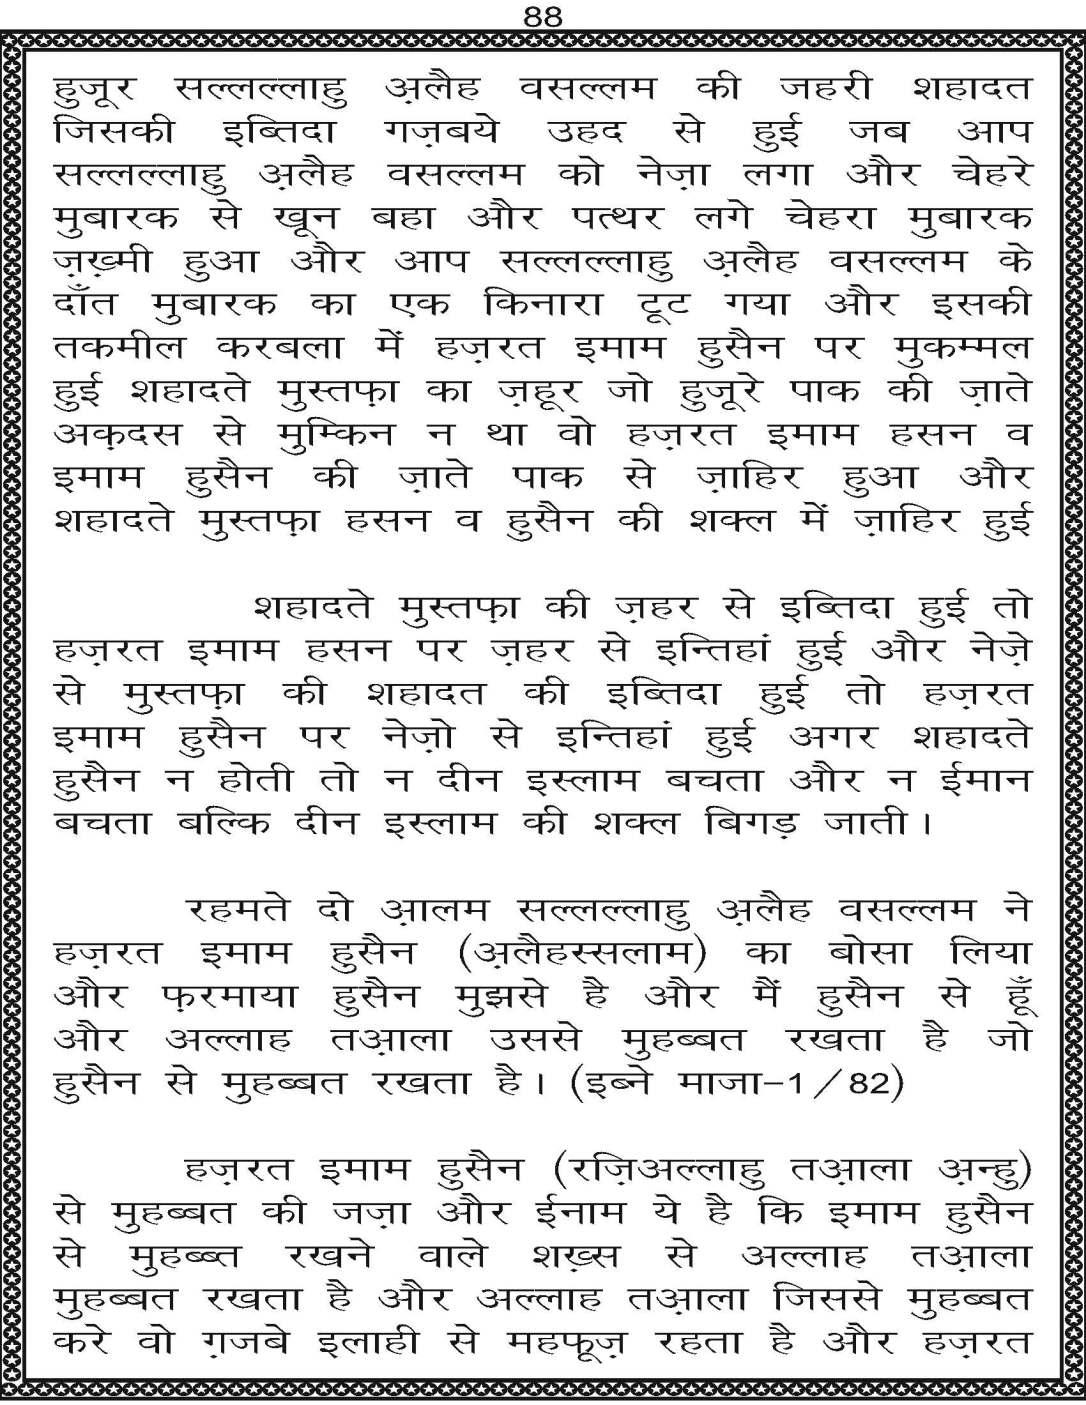 AzmateTaziyadari_Page_088